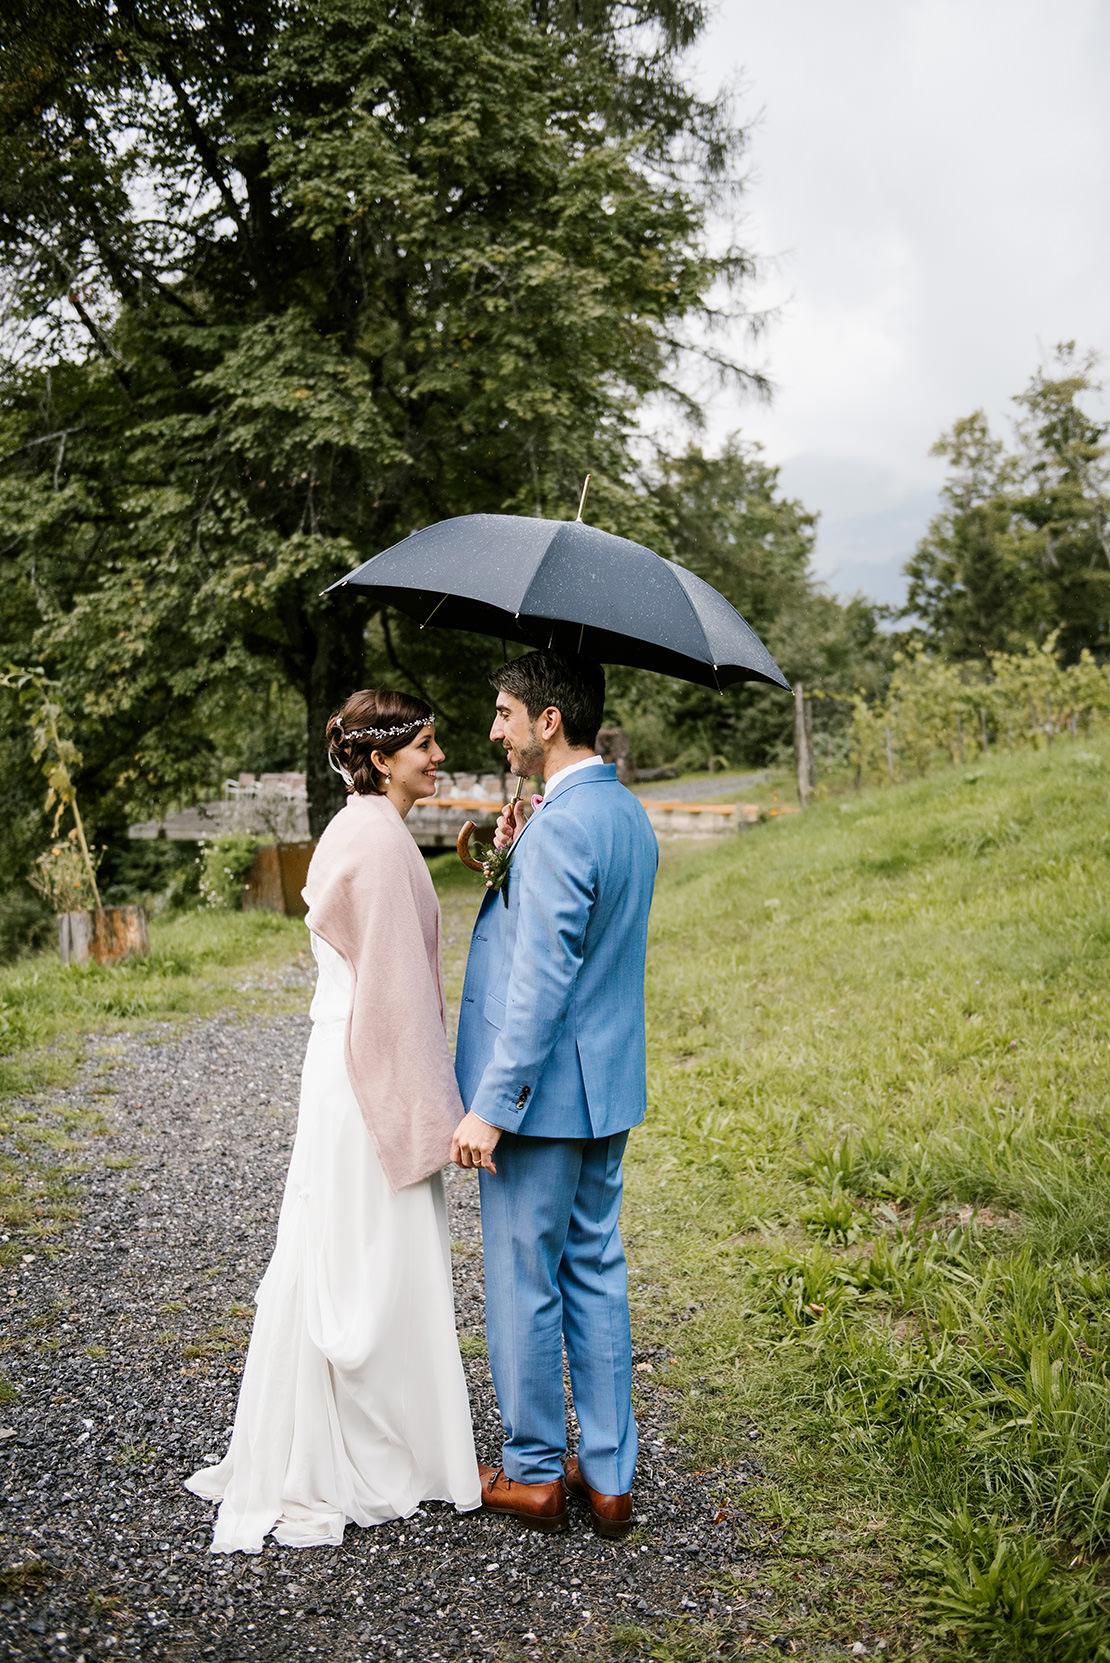 MARIAGE RUSTIQUE À L'HÔTEL WETTERHORN HASLIBERG